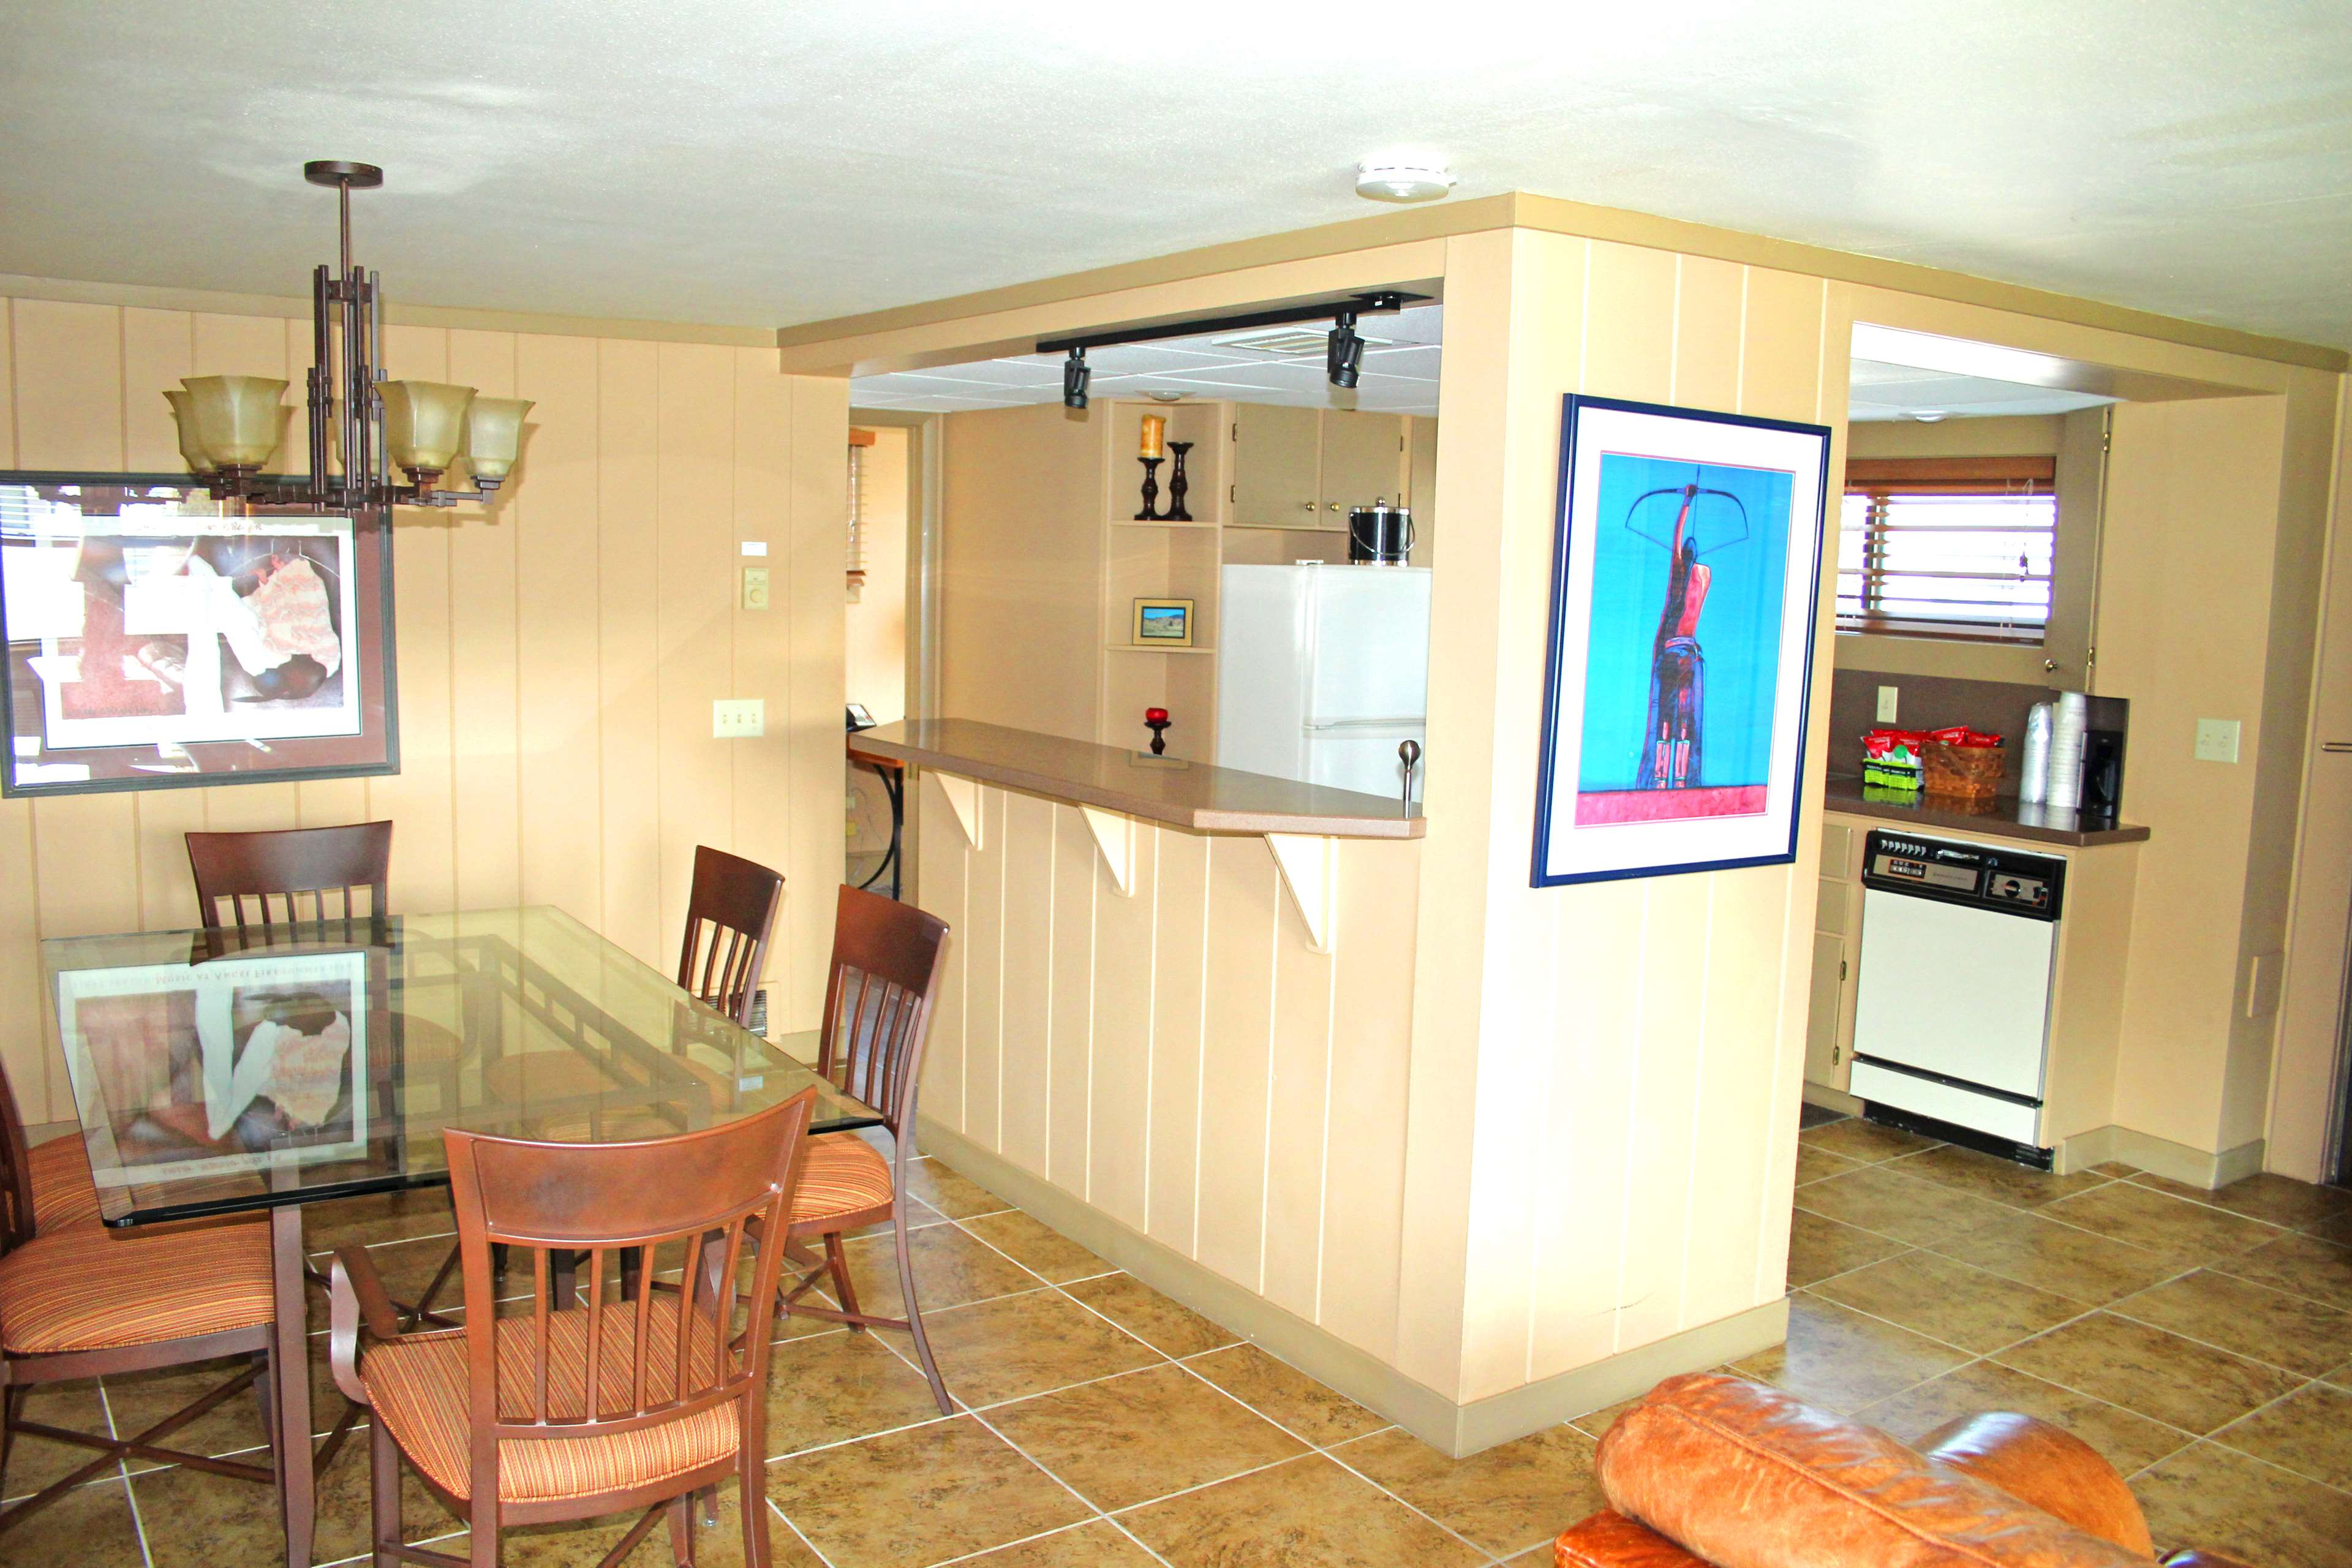 Best Western Sunset Inn Cody Wy Company Profile